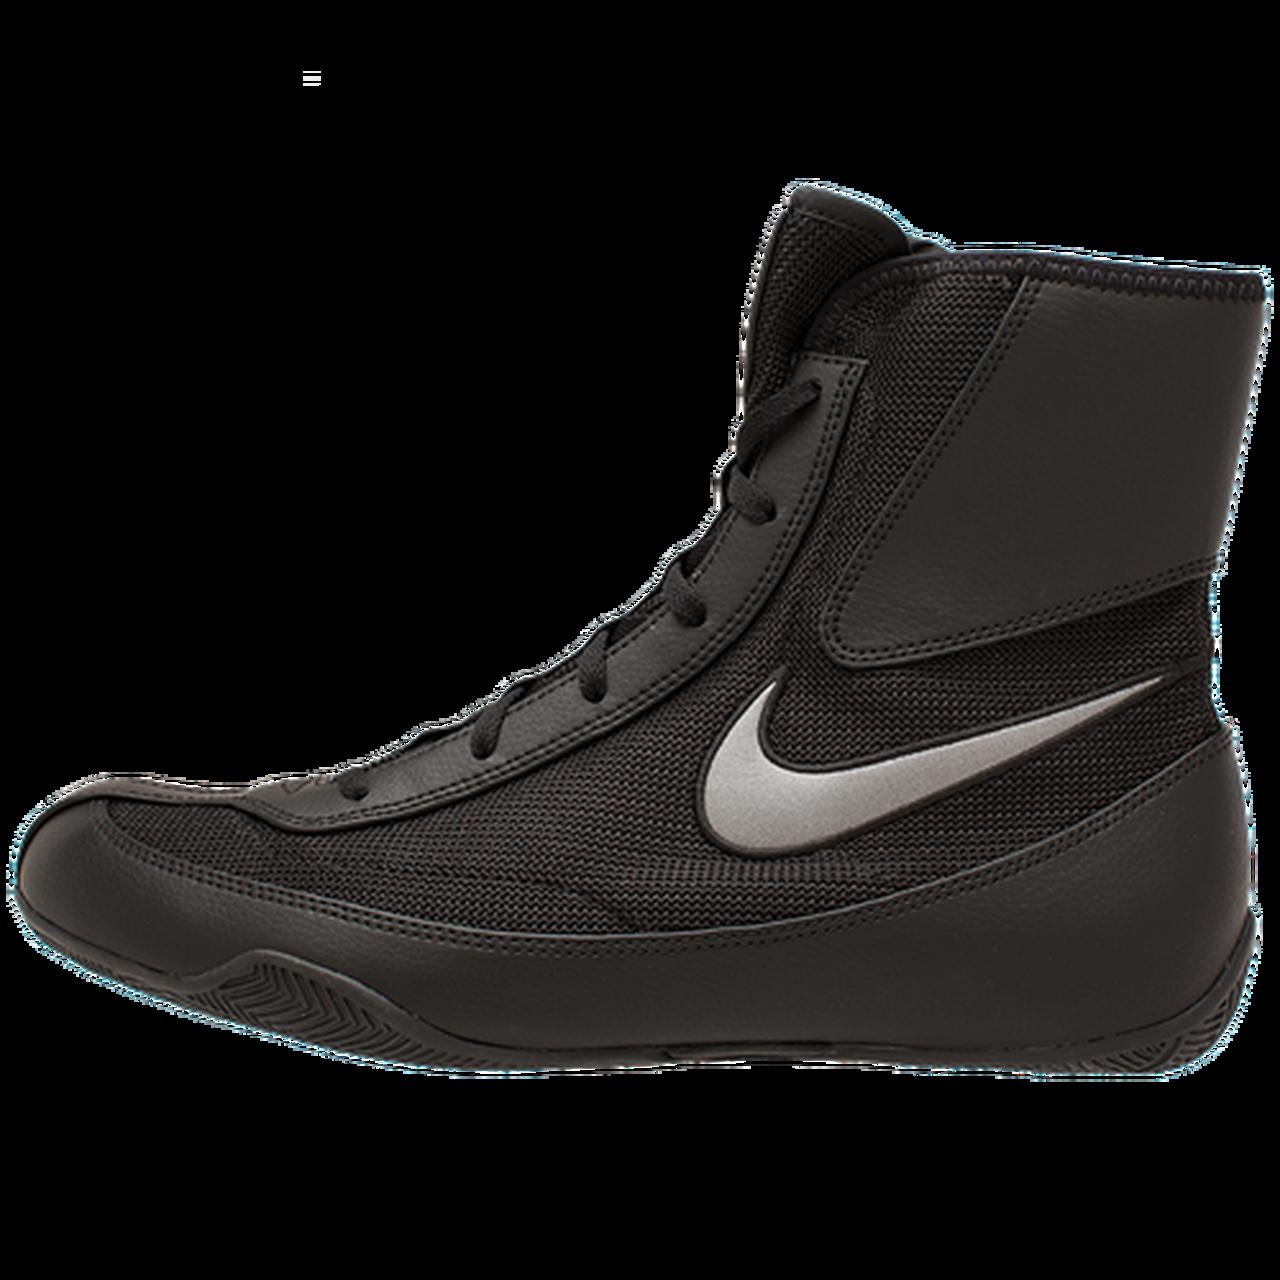 Nike Machomai 2 - Black - Athlete